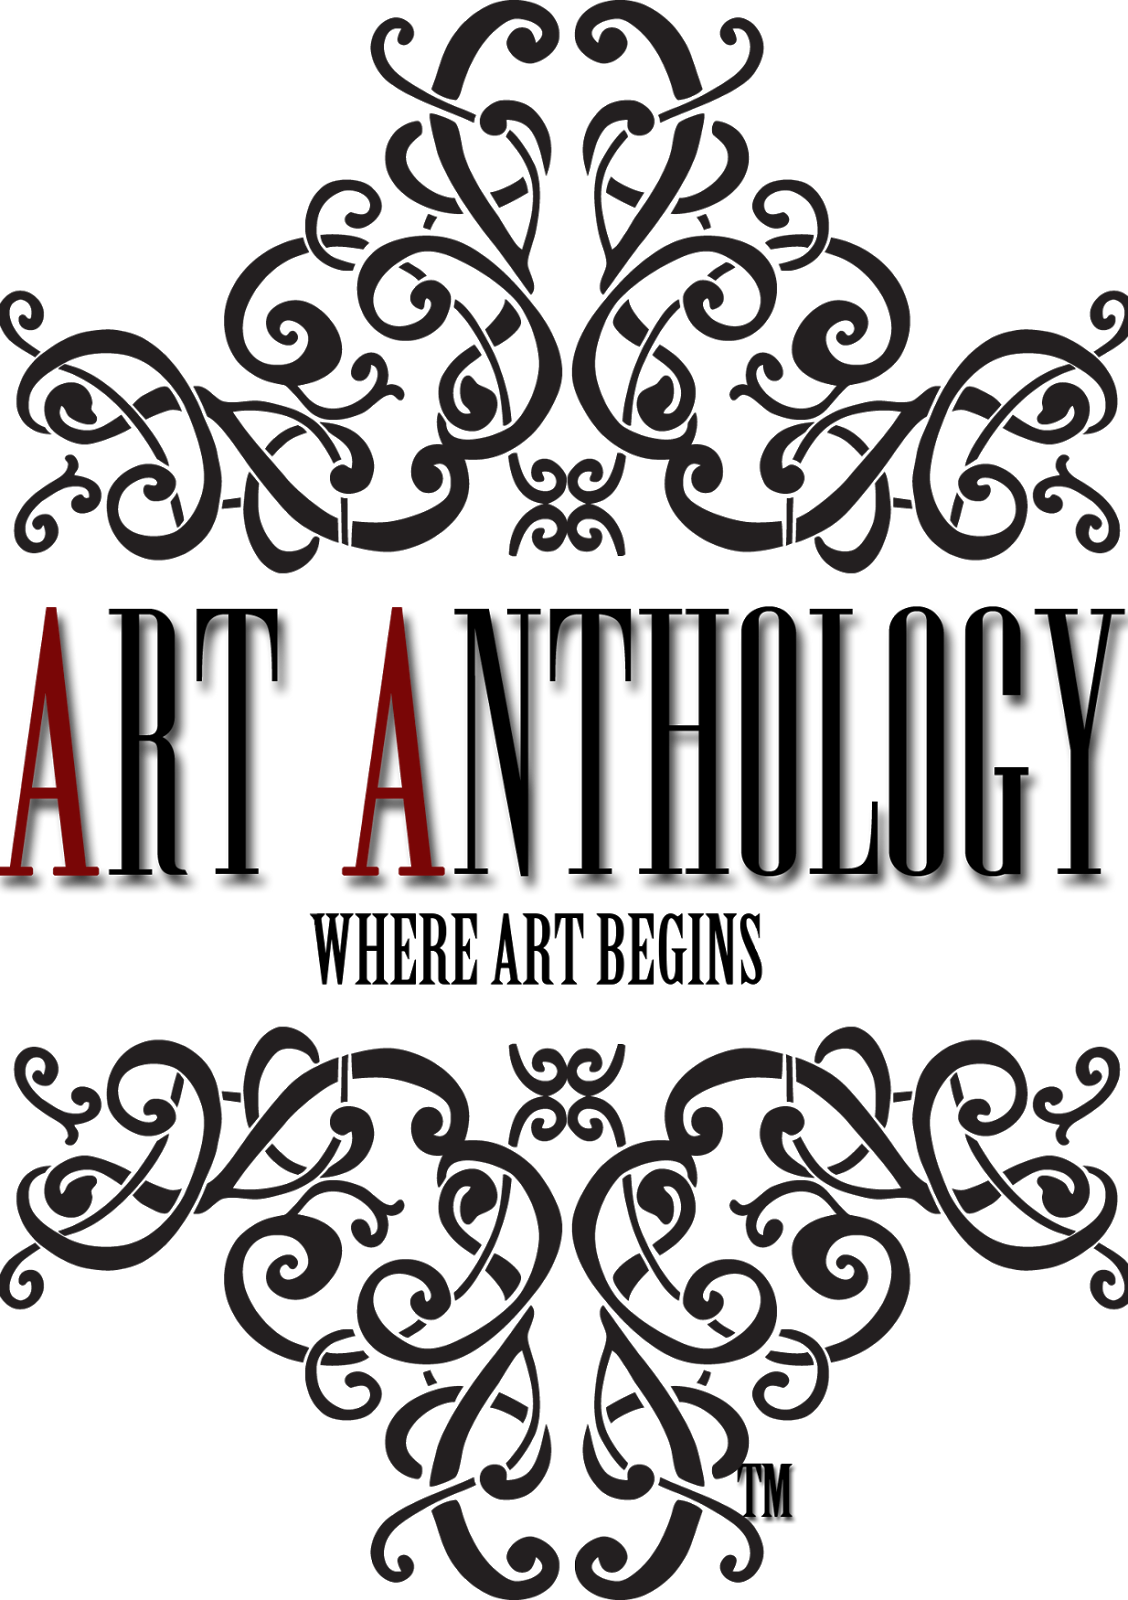 http://www.artanthologyinc.com/